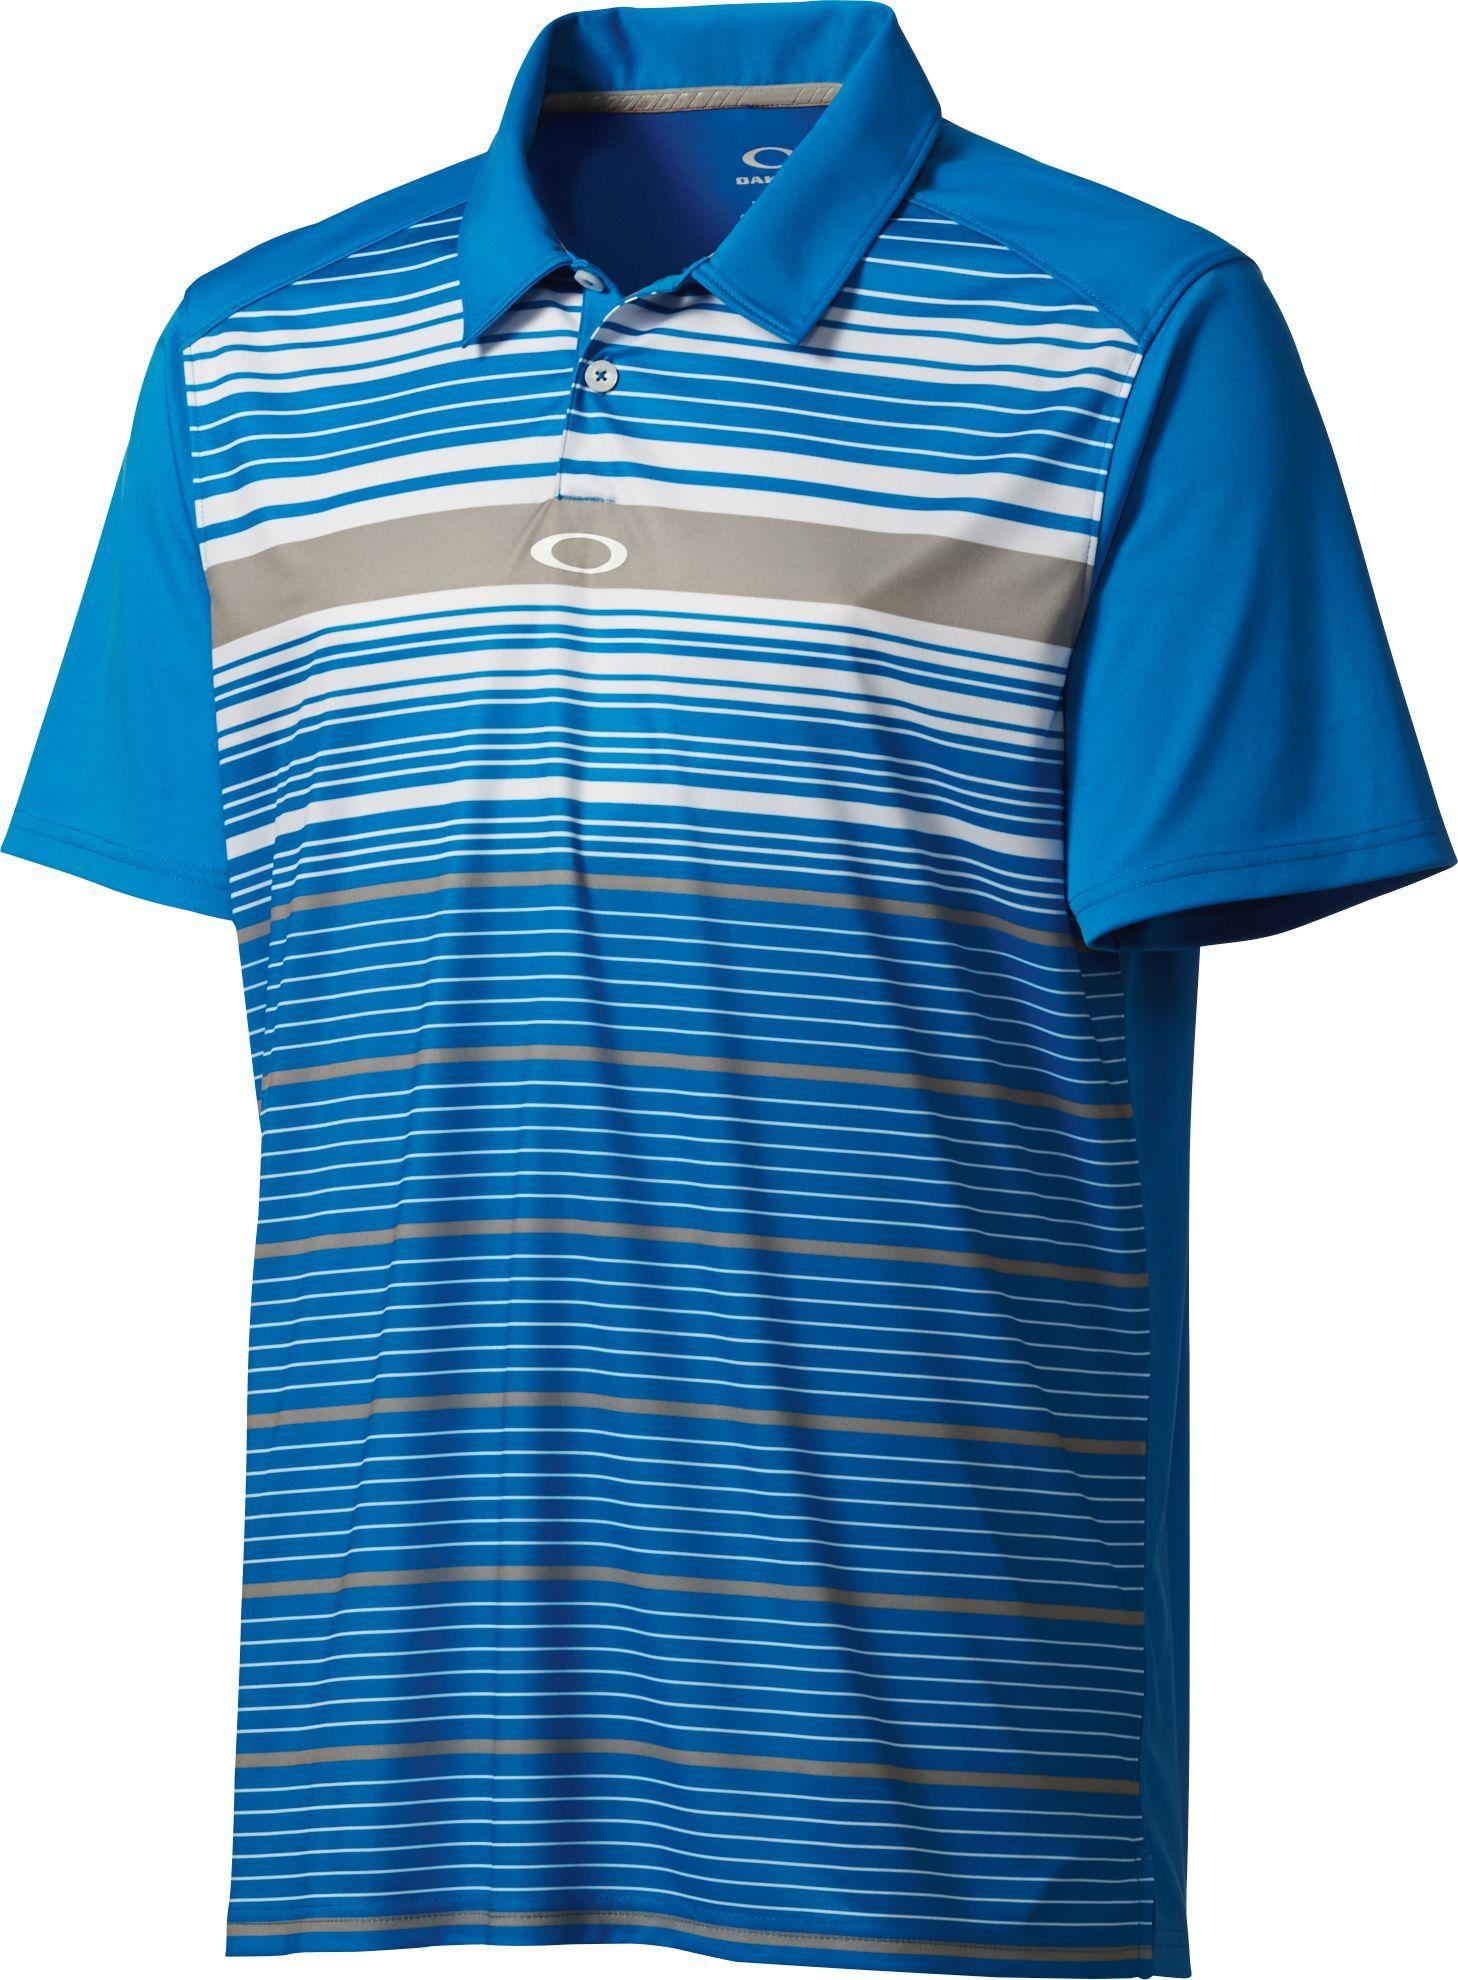 9761d39ba8 Oakley Legacy Stripe Polo | Golf Galaxy Mens Polo T Shirts, Golf Shirts,  Oakley